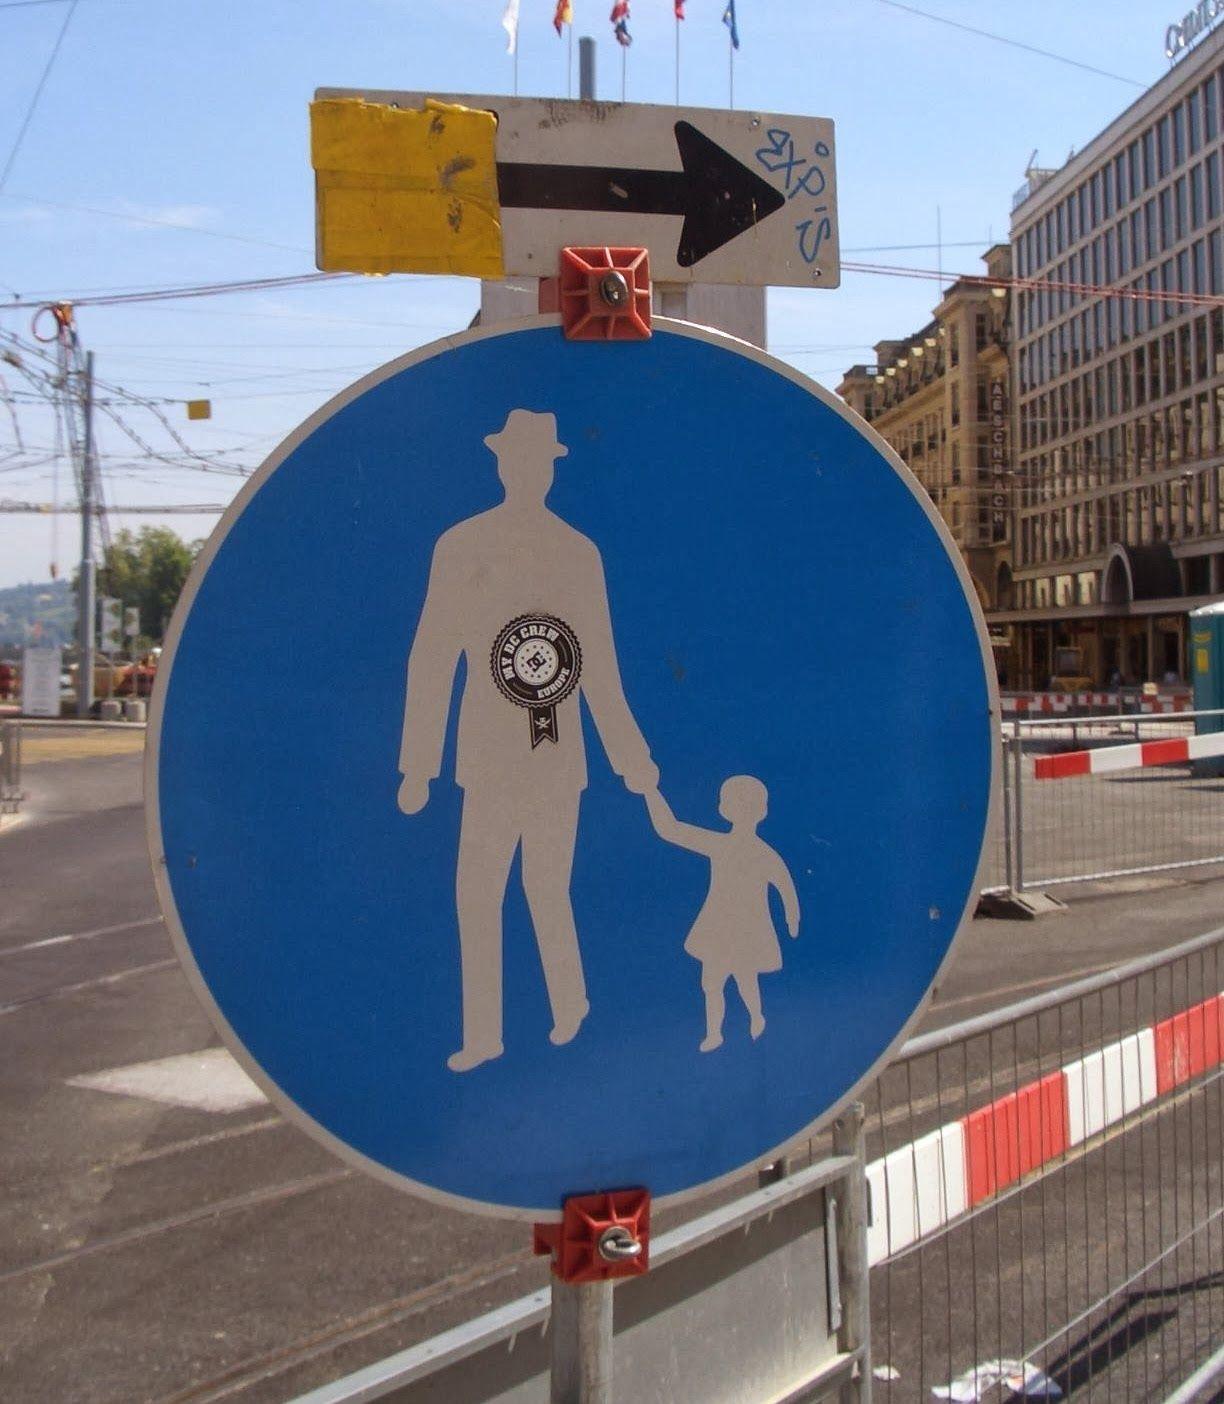 Pavulagem Da Ro Gender Inequality Traffic Signs That Speak Gender Inequality Intersectionality Sociology